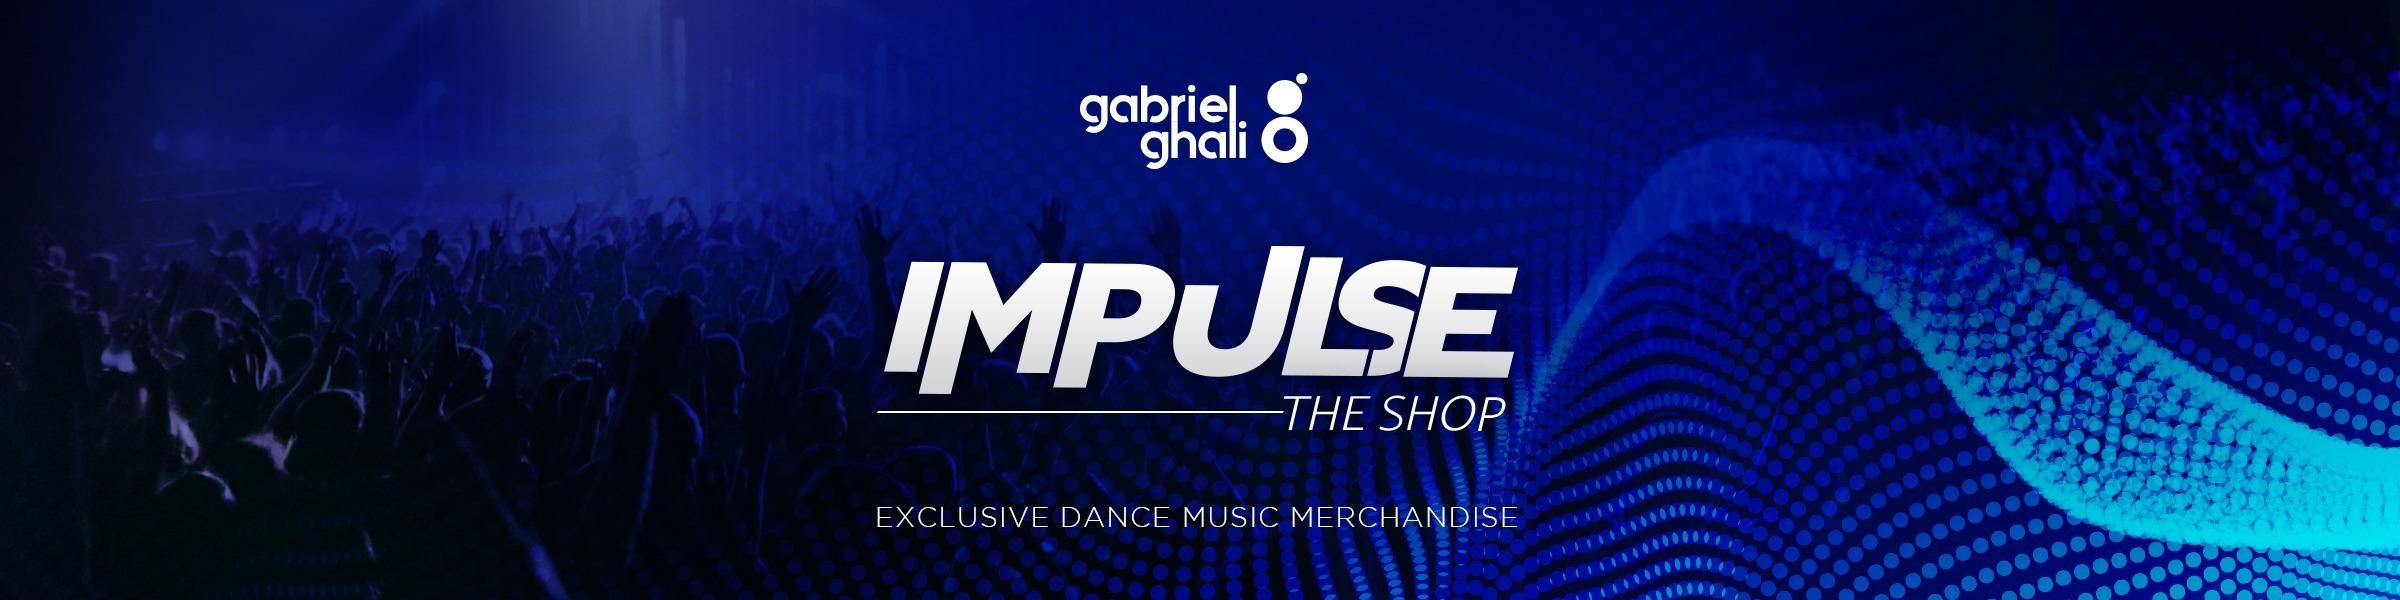 Gabriel  (@gabrielghali) Cover Image